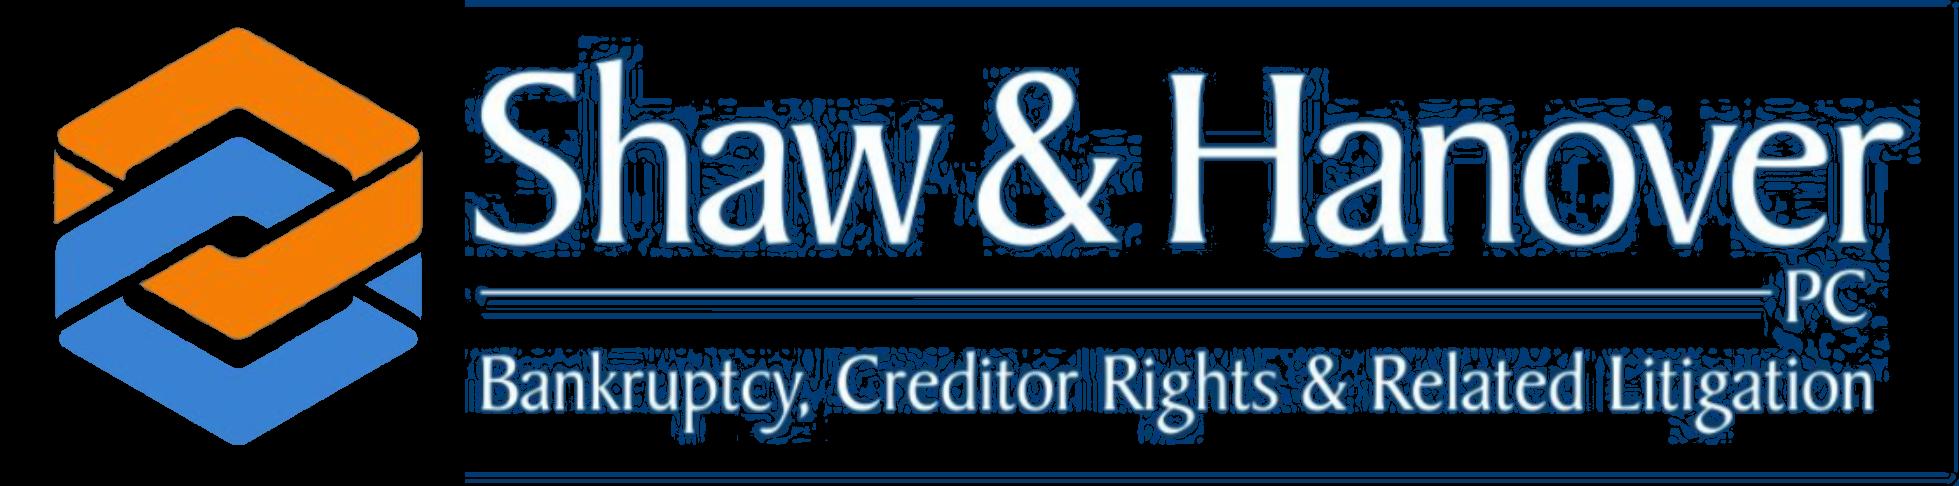 Shaw & Hanover PC